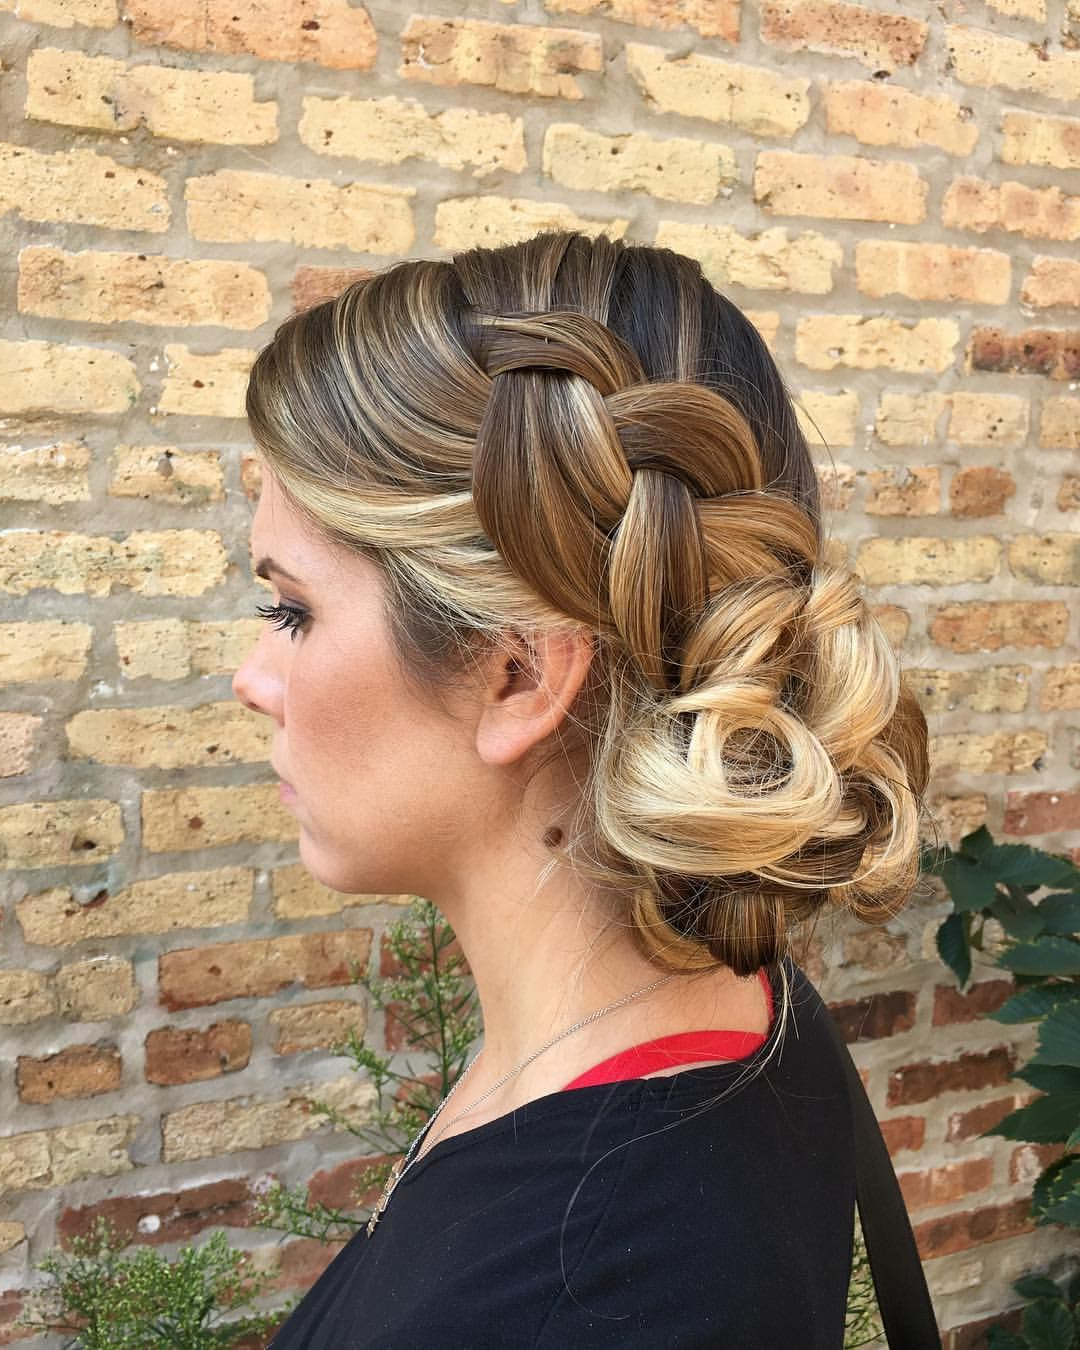 Hair + Makeupgoldplaited (View 10 of 20)